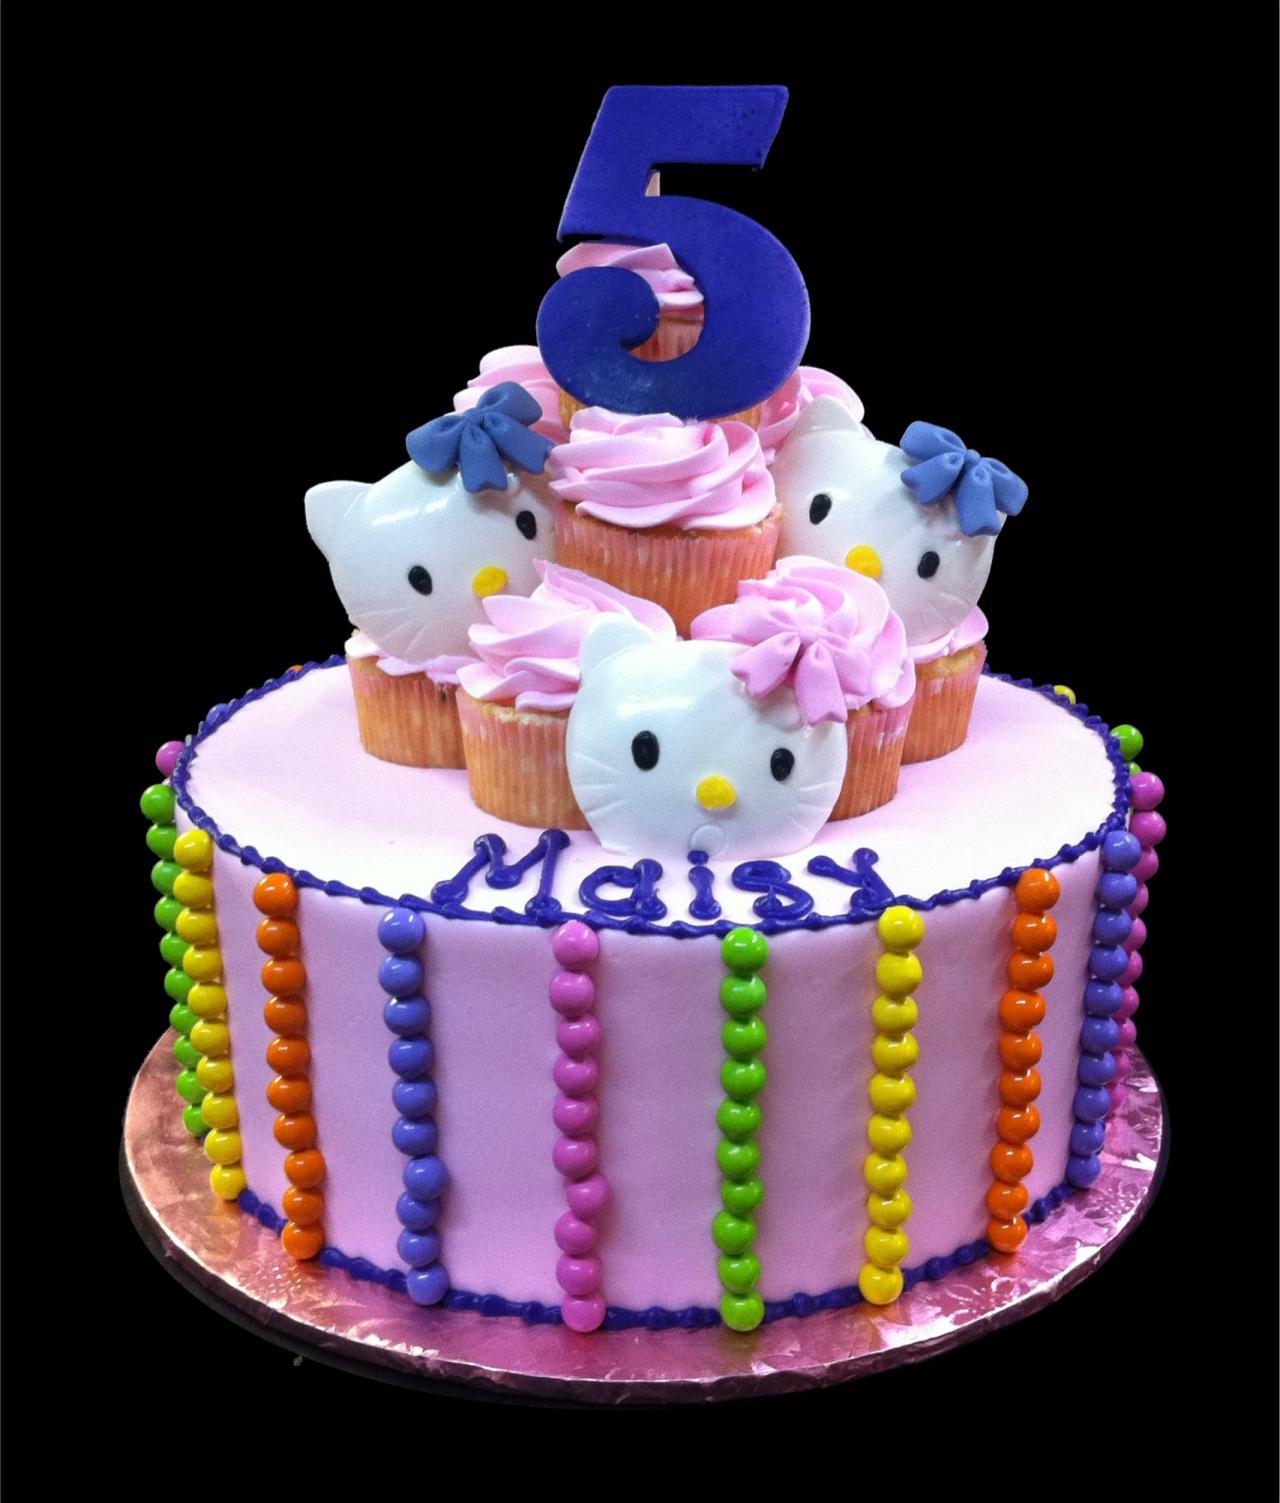 11 Designs For 5th Birthday Cupcakes Photo Happy 5th Birthday Cake